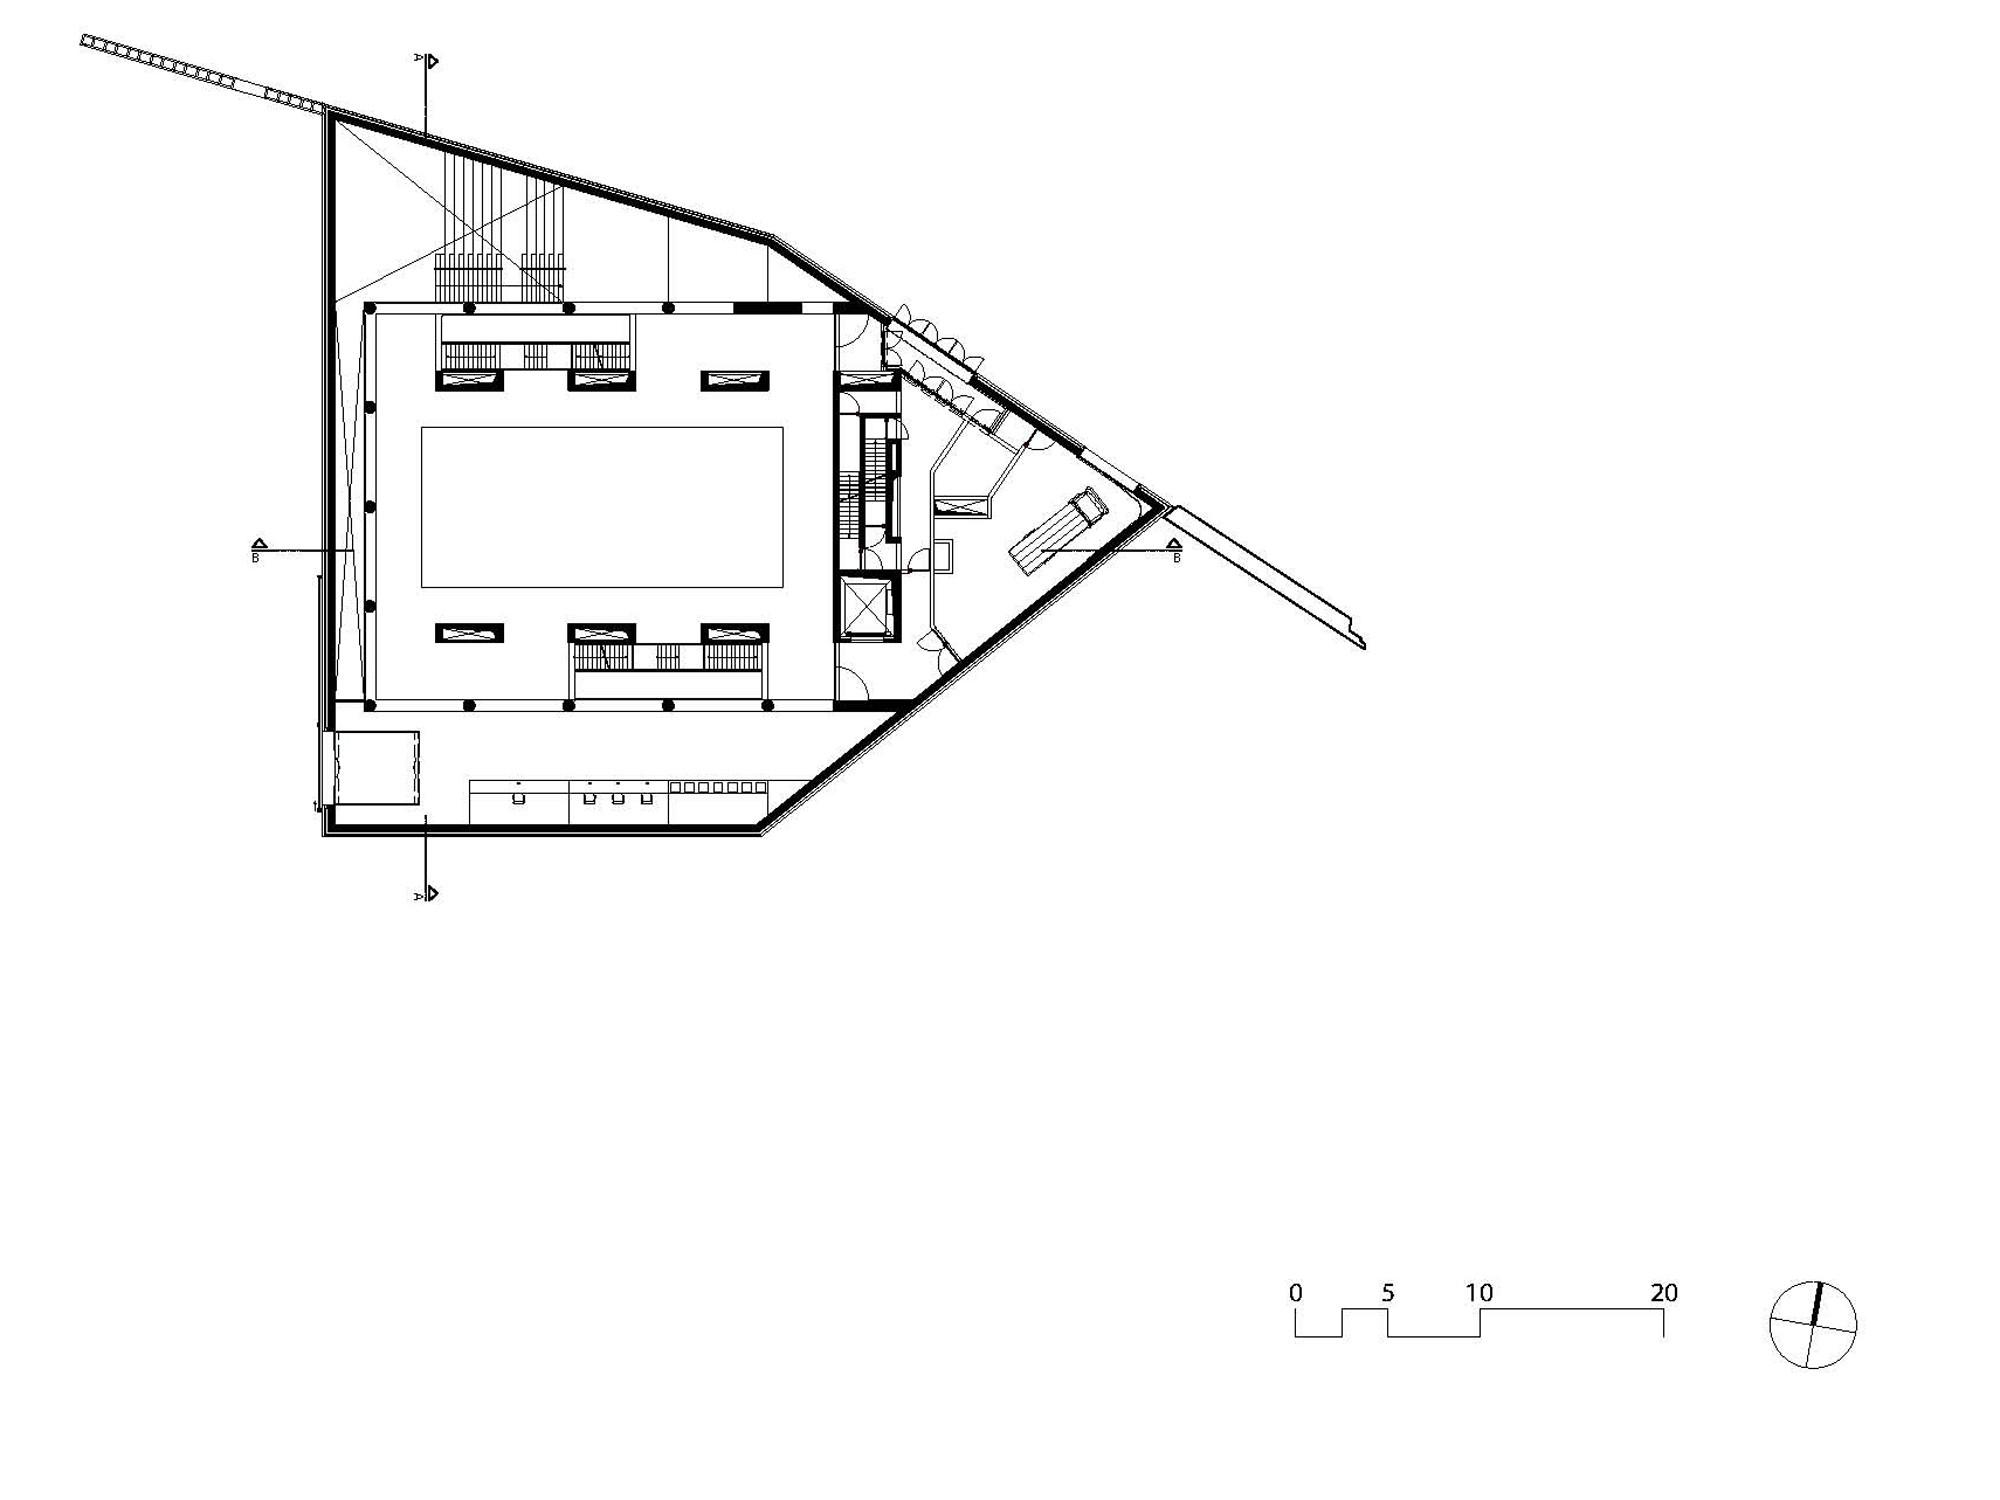 Foyer Museum Grundriss : Museum kazerne dossin in mechelen mauerwerk kultur